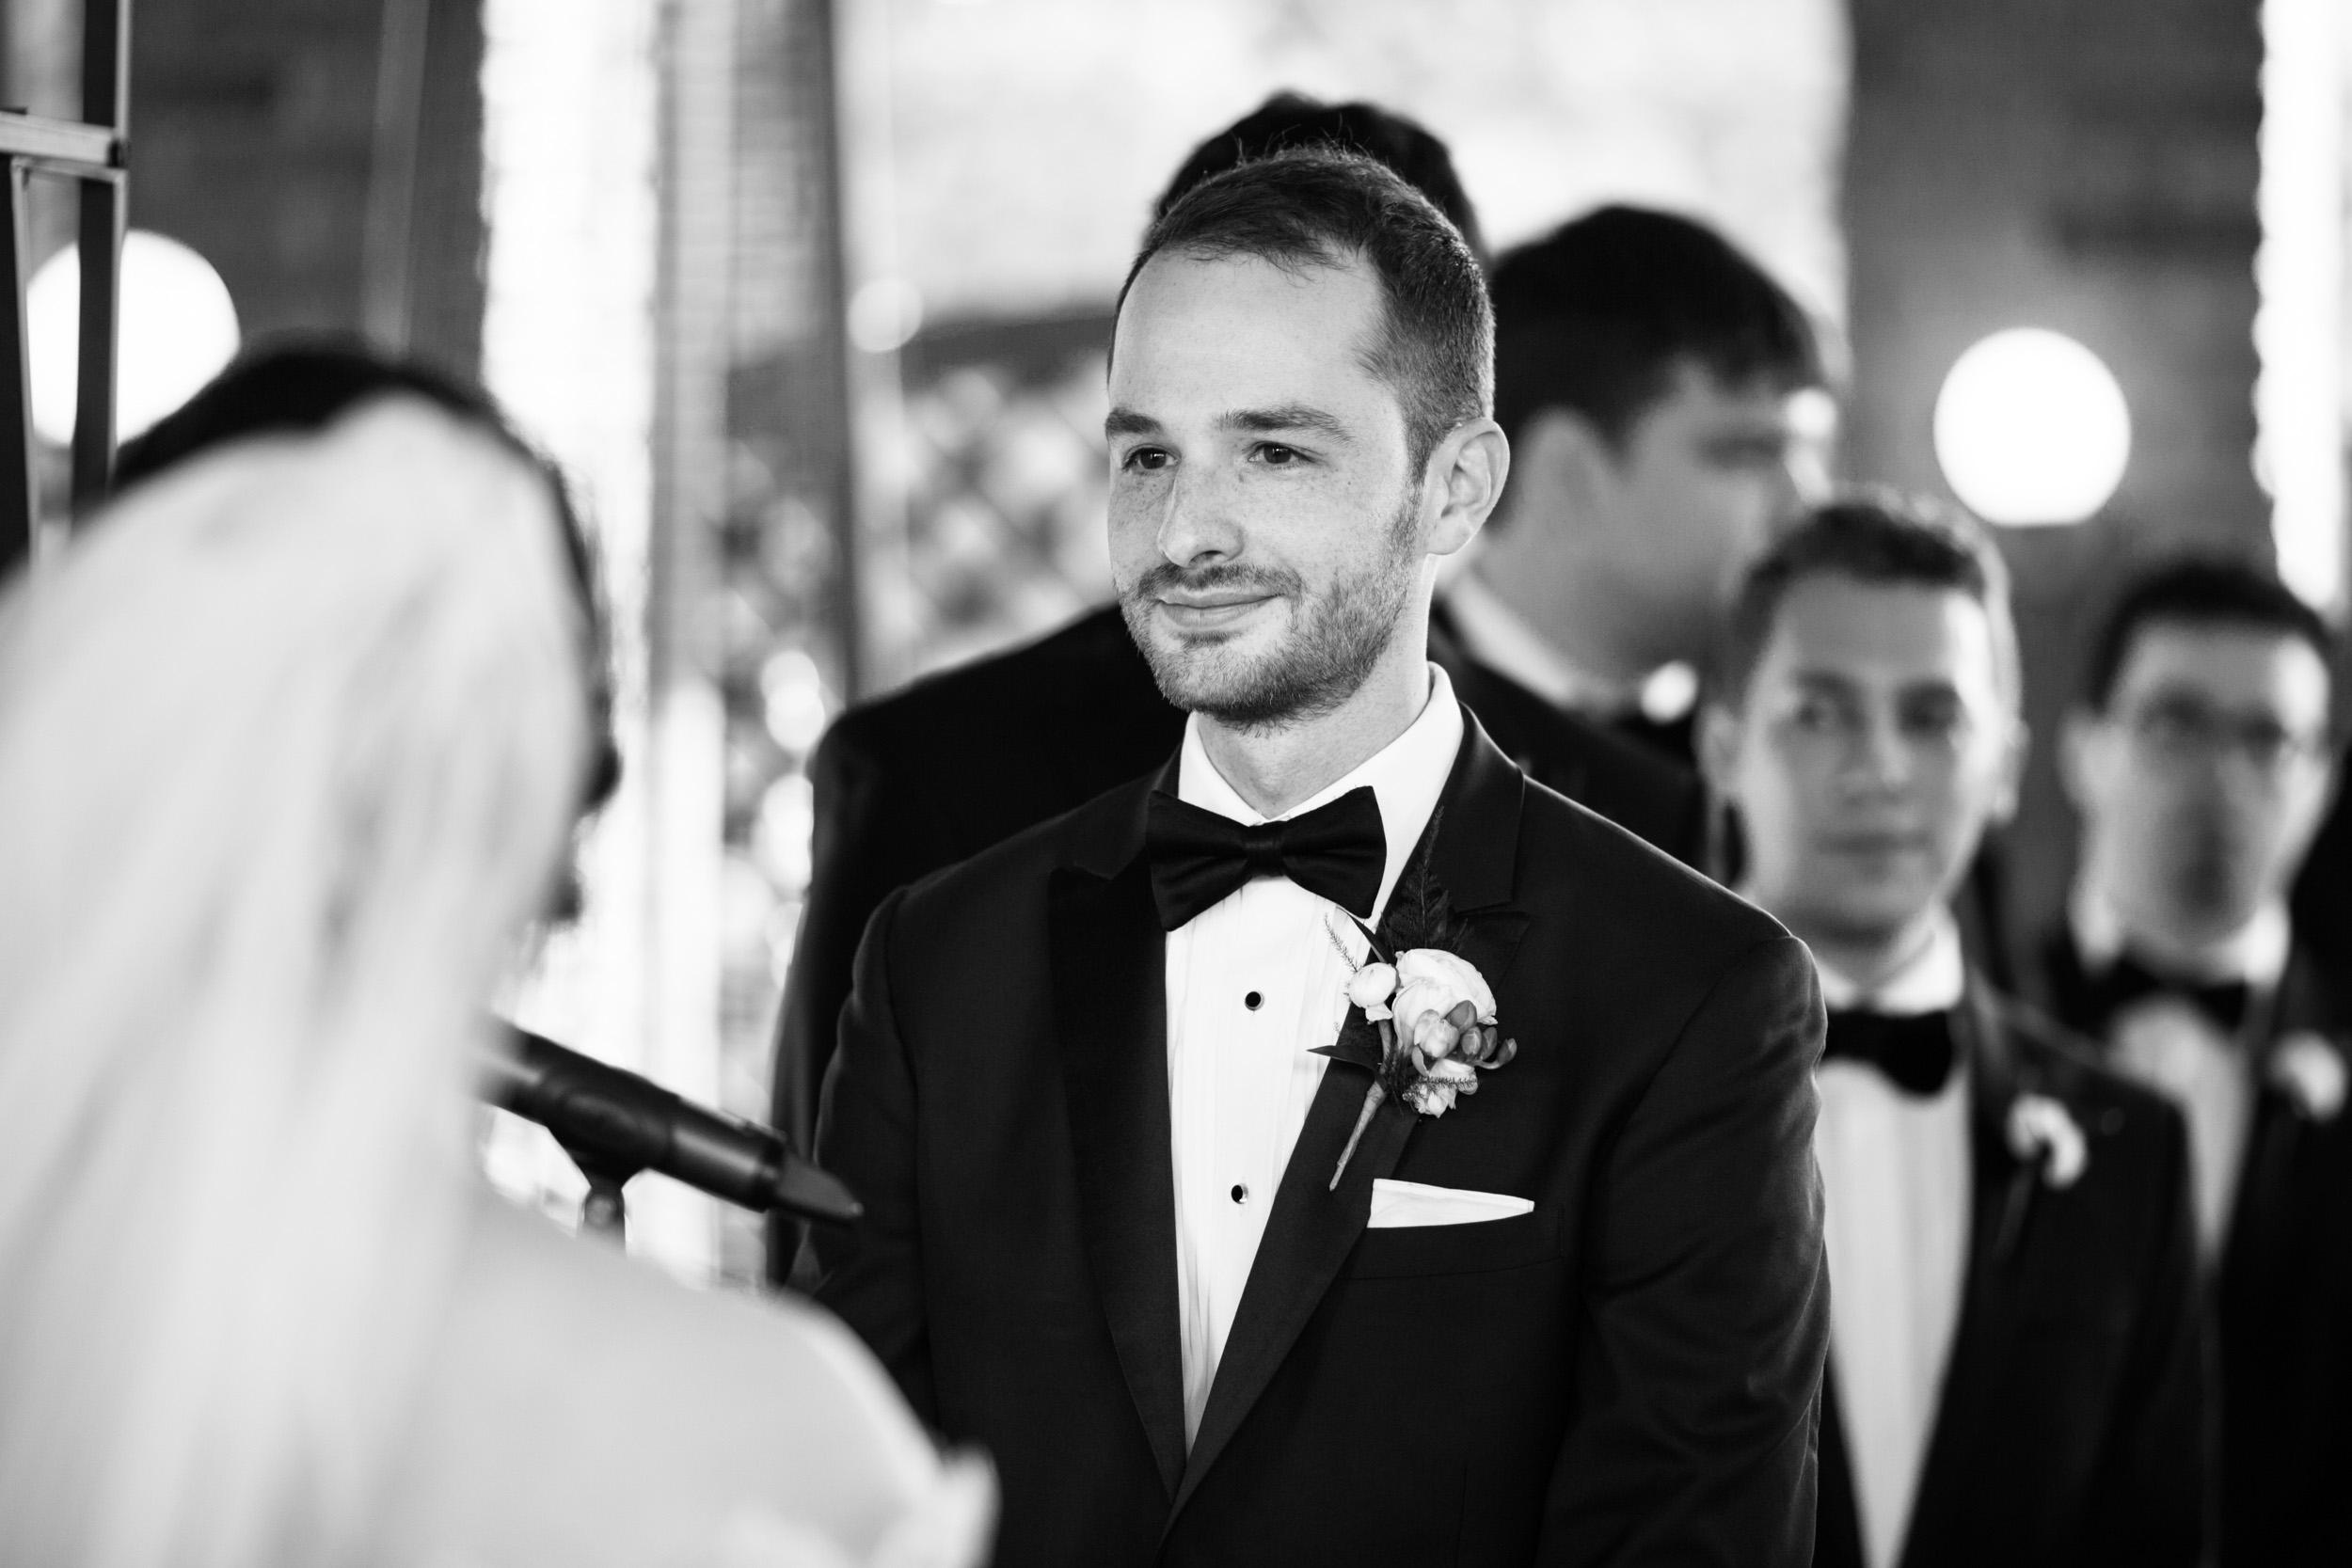 Groom at wedding ceremony Chicago Cafe Brauer